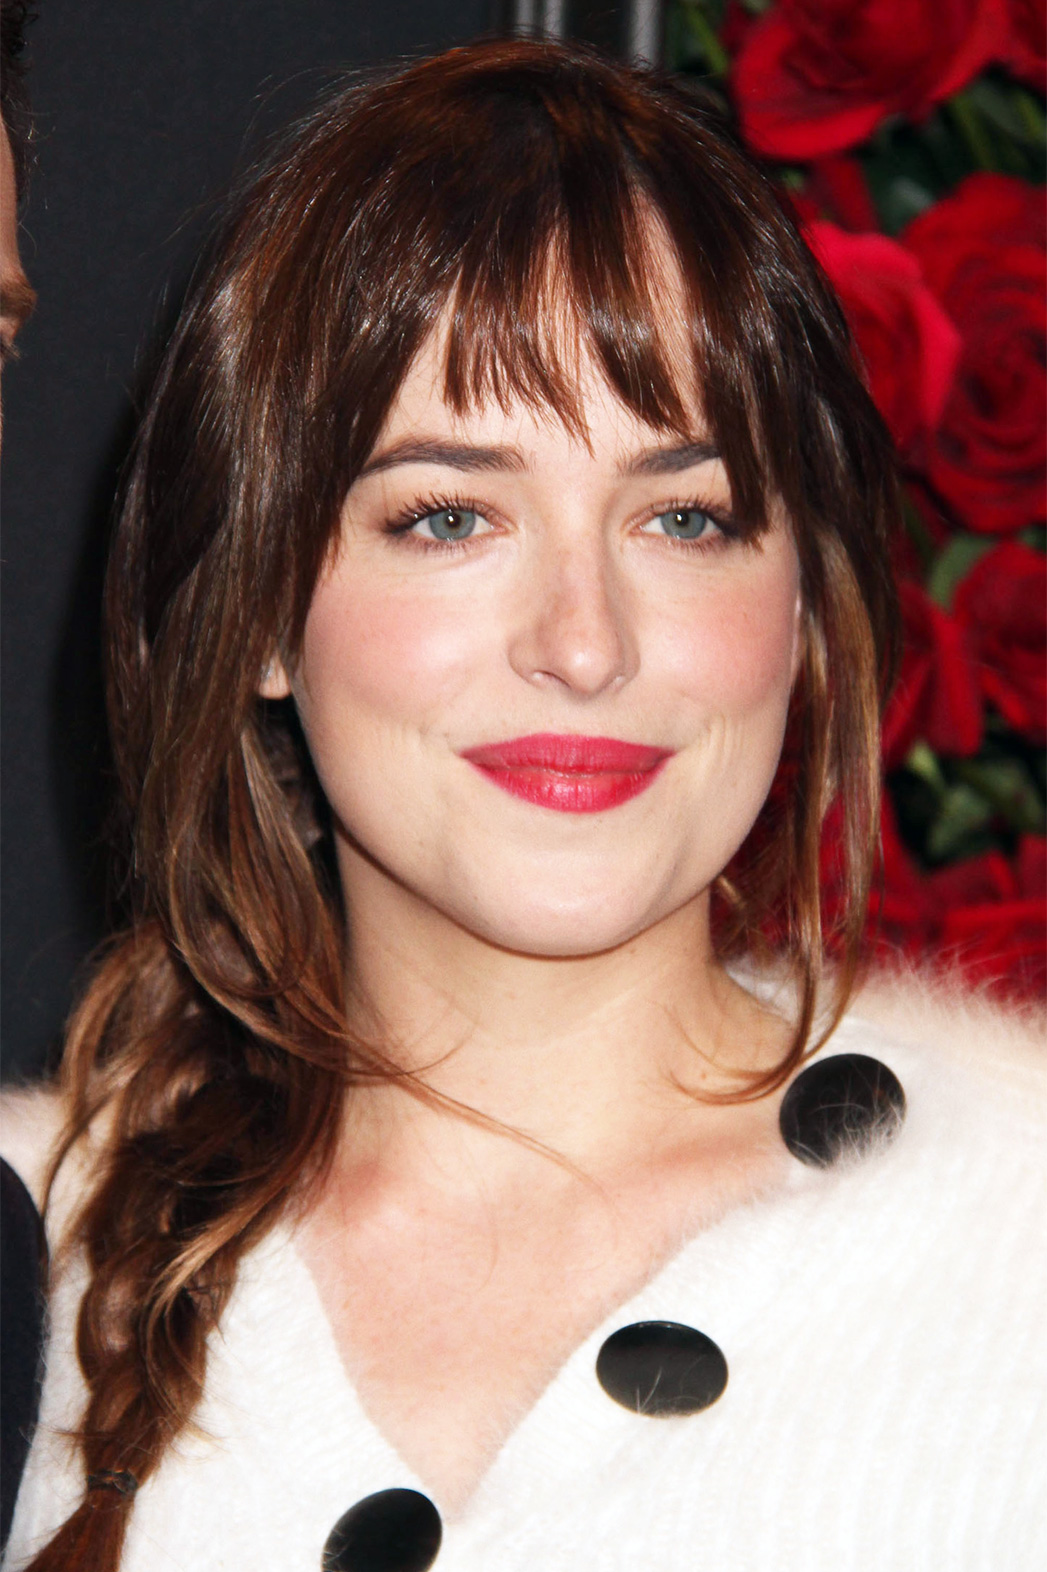 Dakota Johnson 50 Shades of grey NY Screening - P 2015